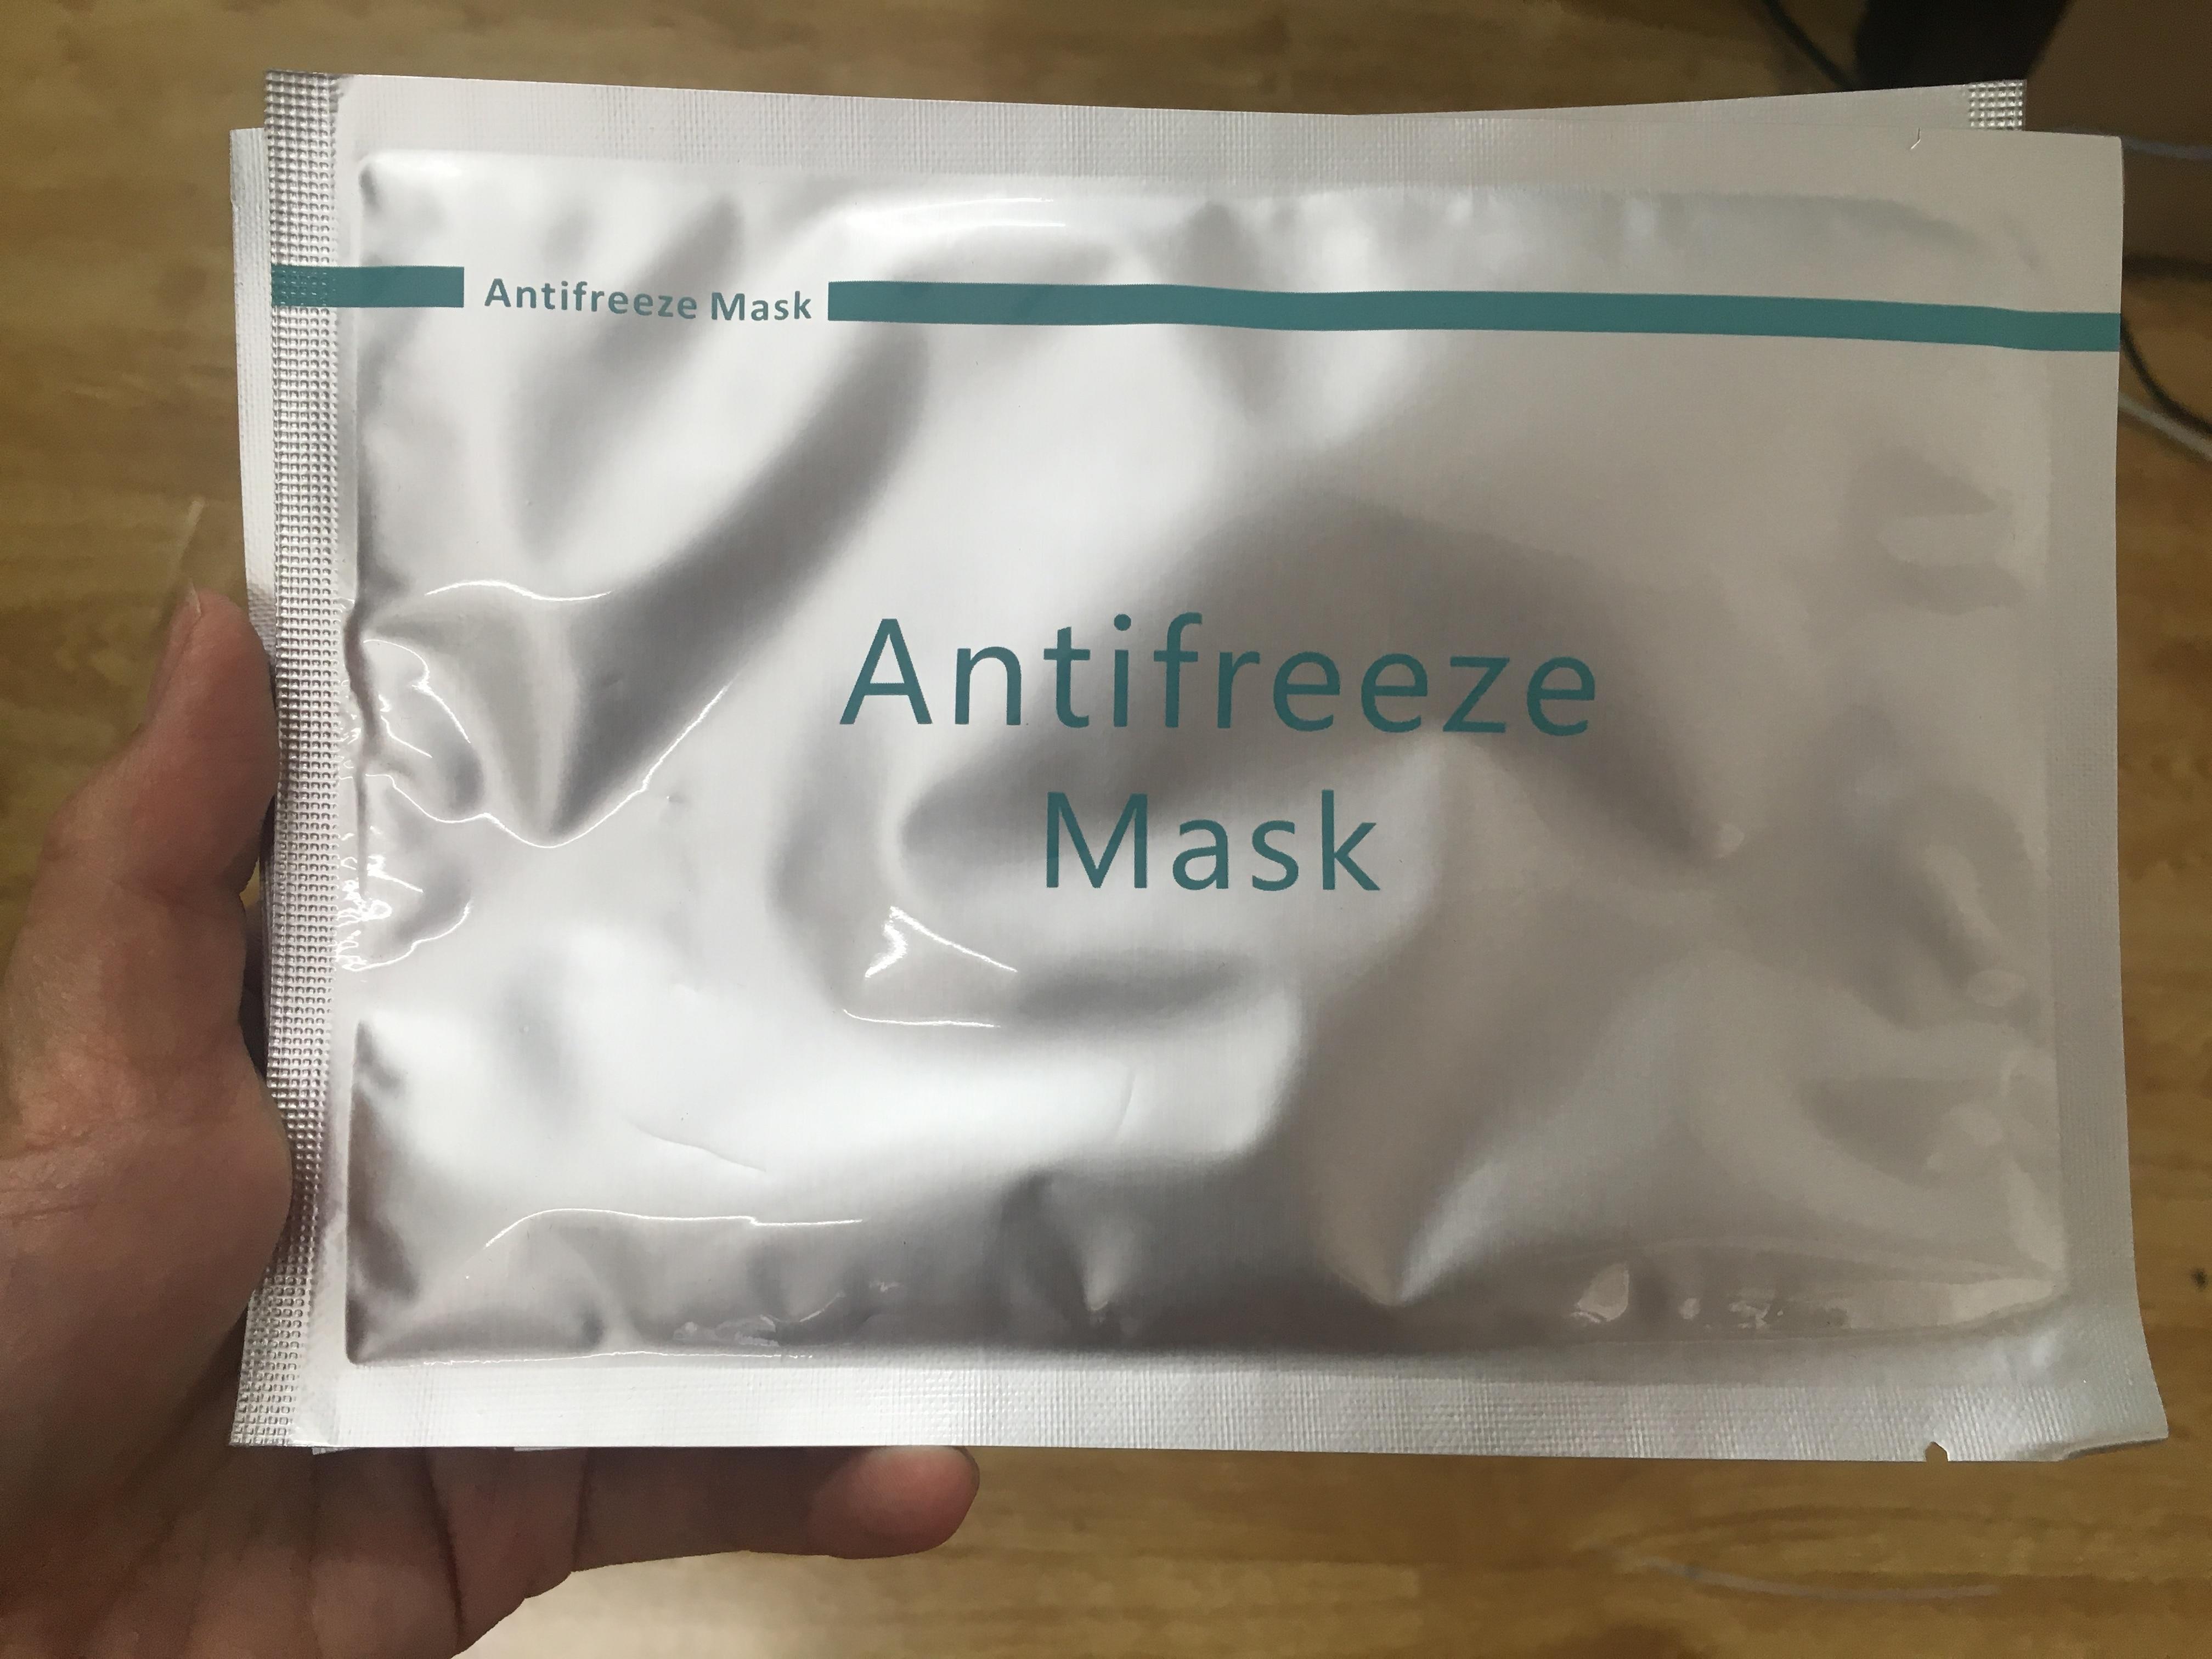 15pc Antifreeze Anti Freezing Membrane Mask For Slimming Cryolipolysis Machine